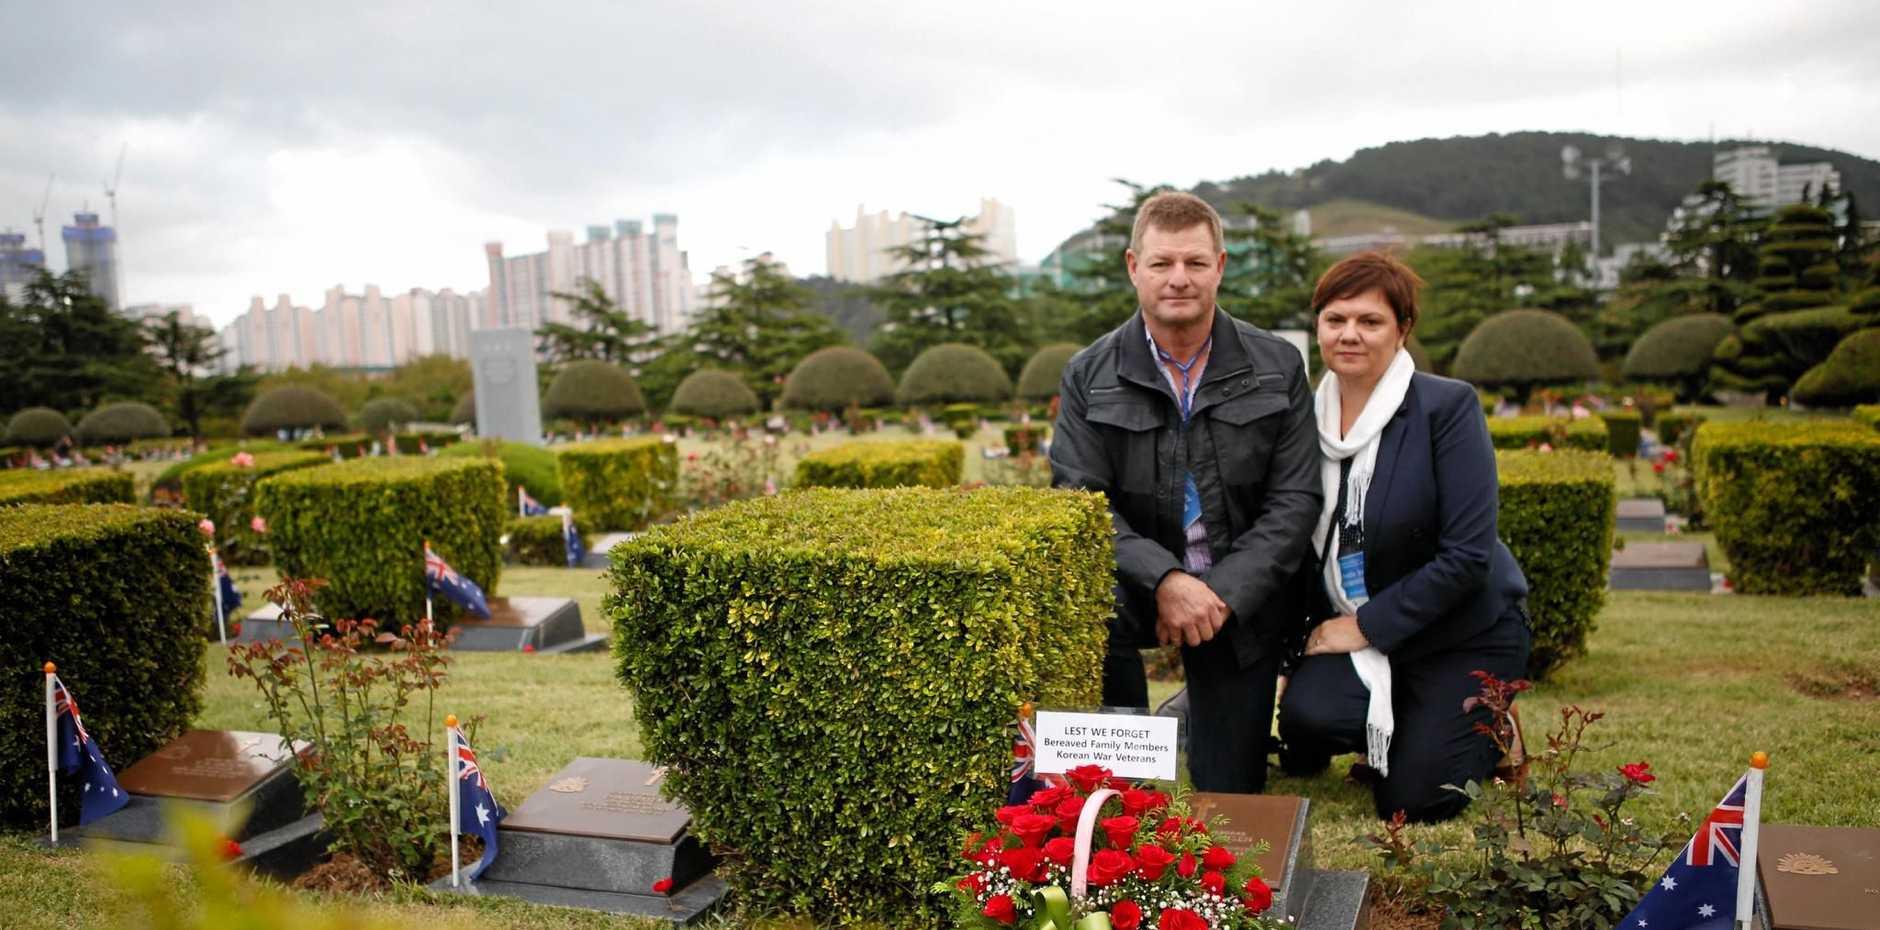 SOMBRE REUNION: Peter and Michelle Siebenhausen visit the grave of Lance-Corporal Norman Siebenhausen in Pusan, South Korea.